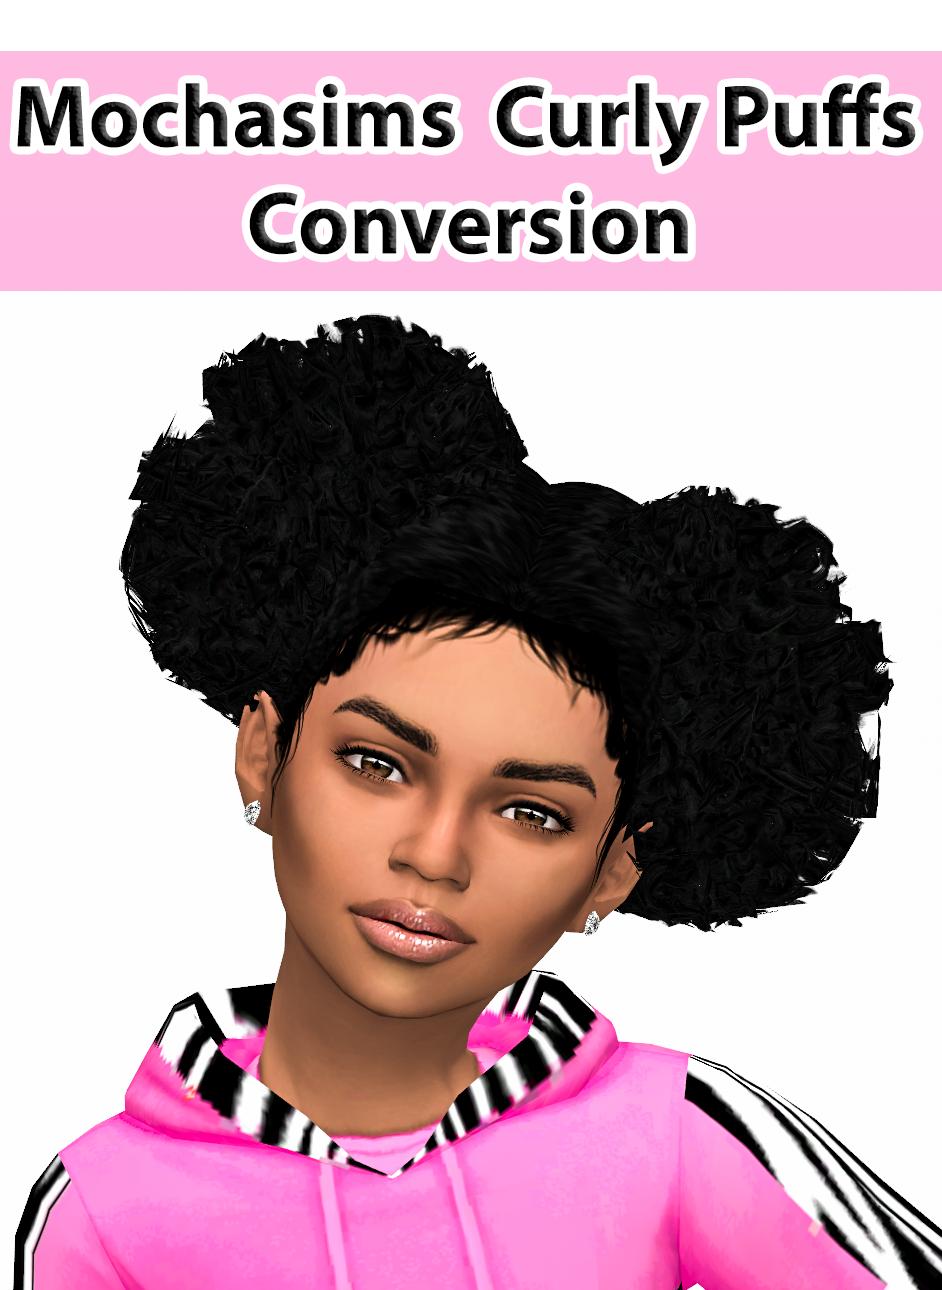 Ebonix  Mochasims Curly Puffs  Ebonixsims  Sims 4 Urban Cc-7728